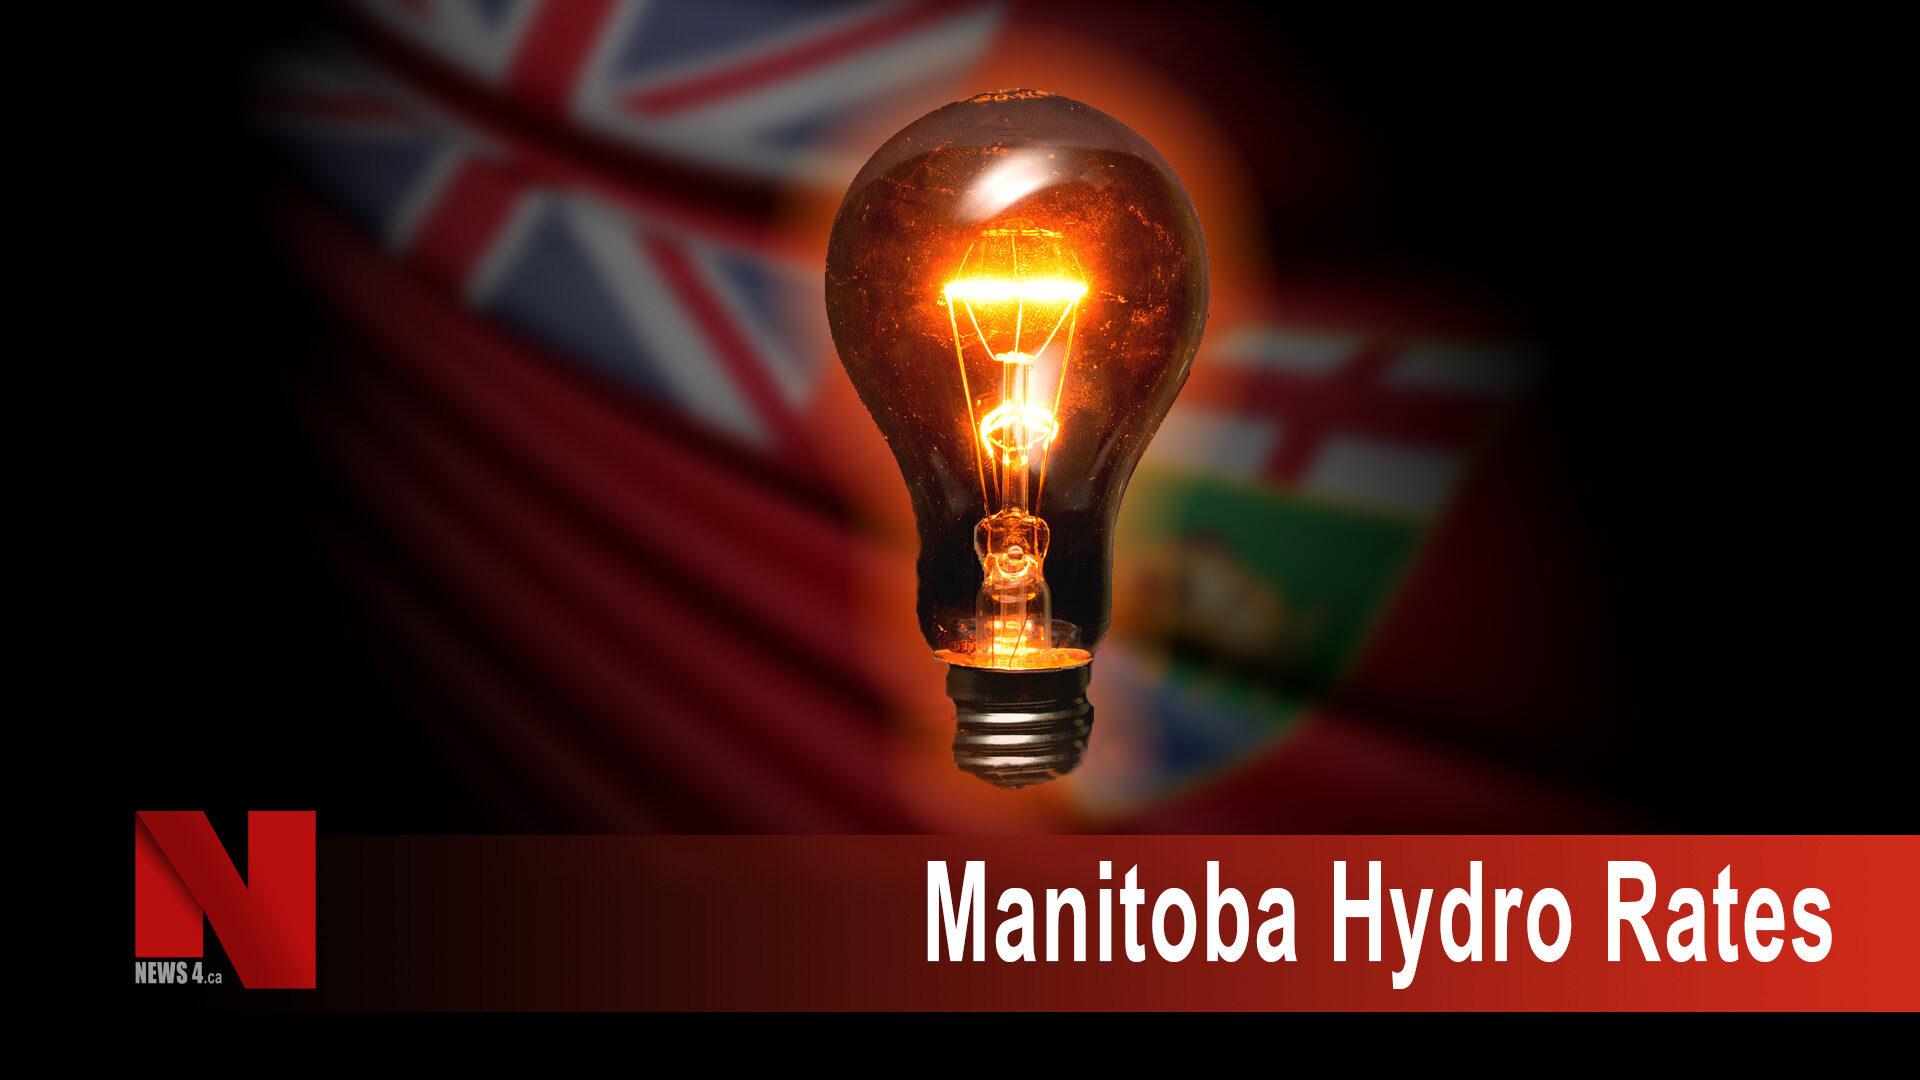 Manitoba Hydro Rates